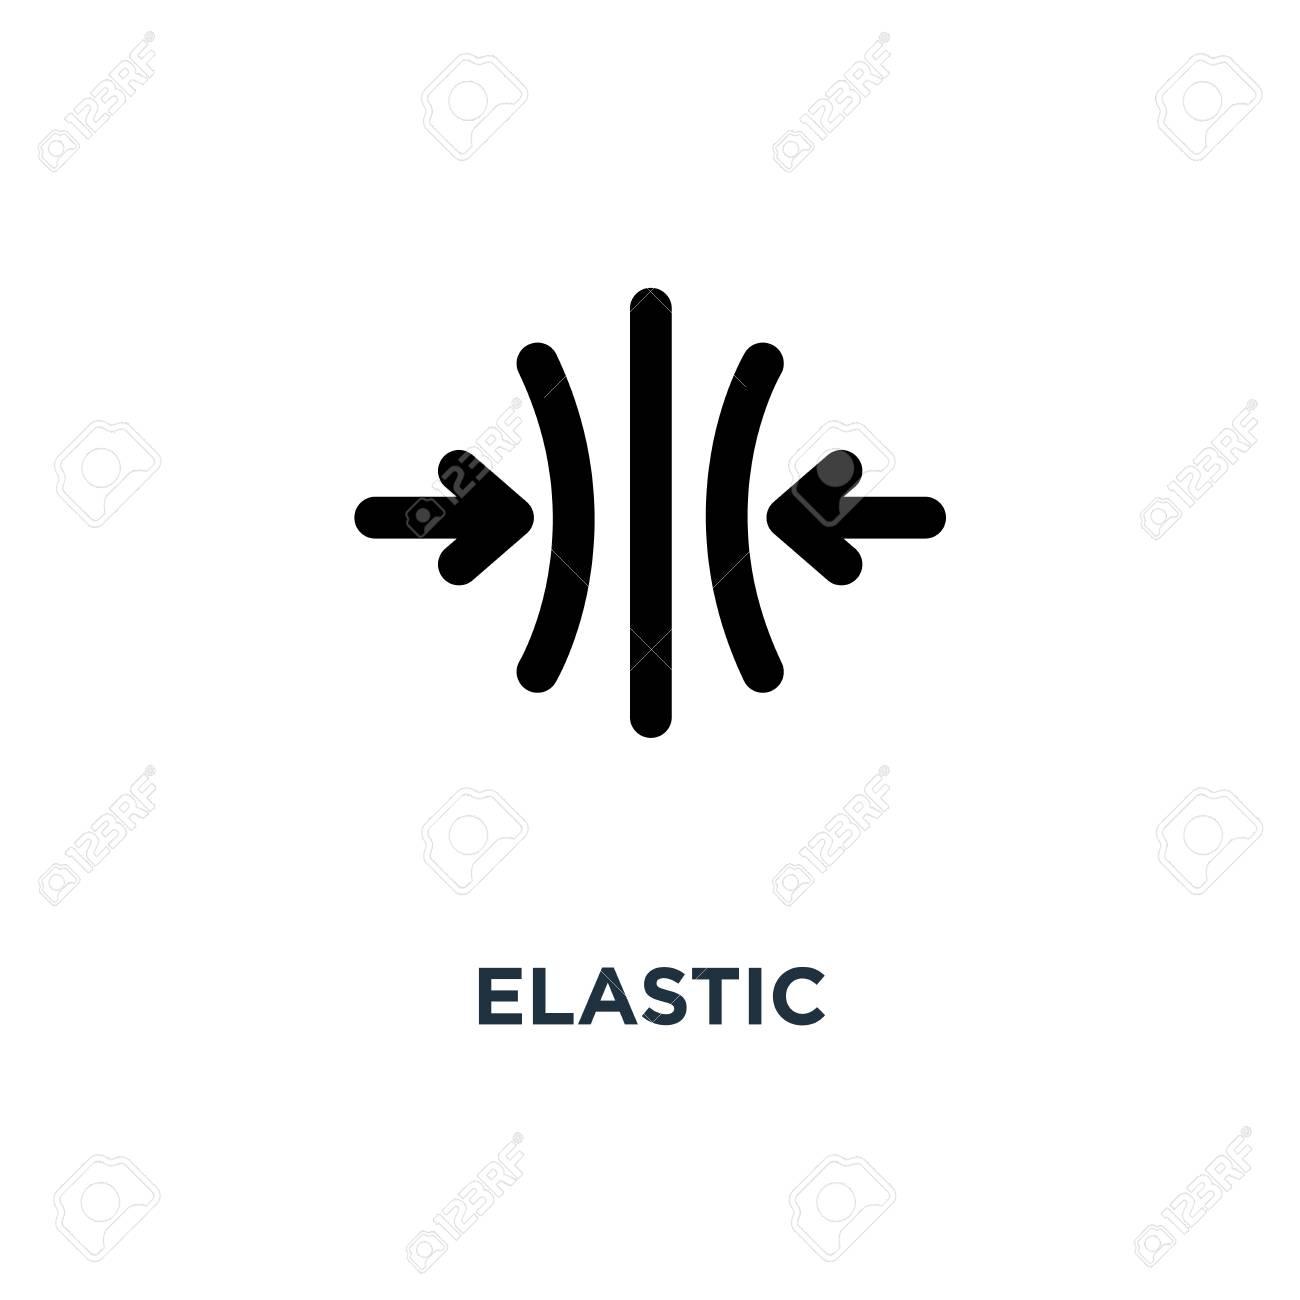 elastic icon. elastic concept symbol design, vector illustration - 109719688